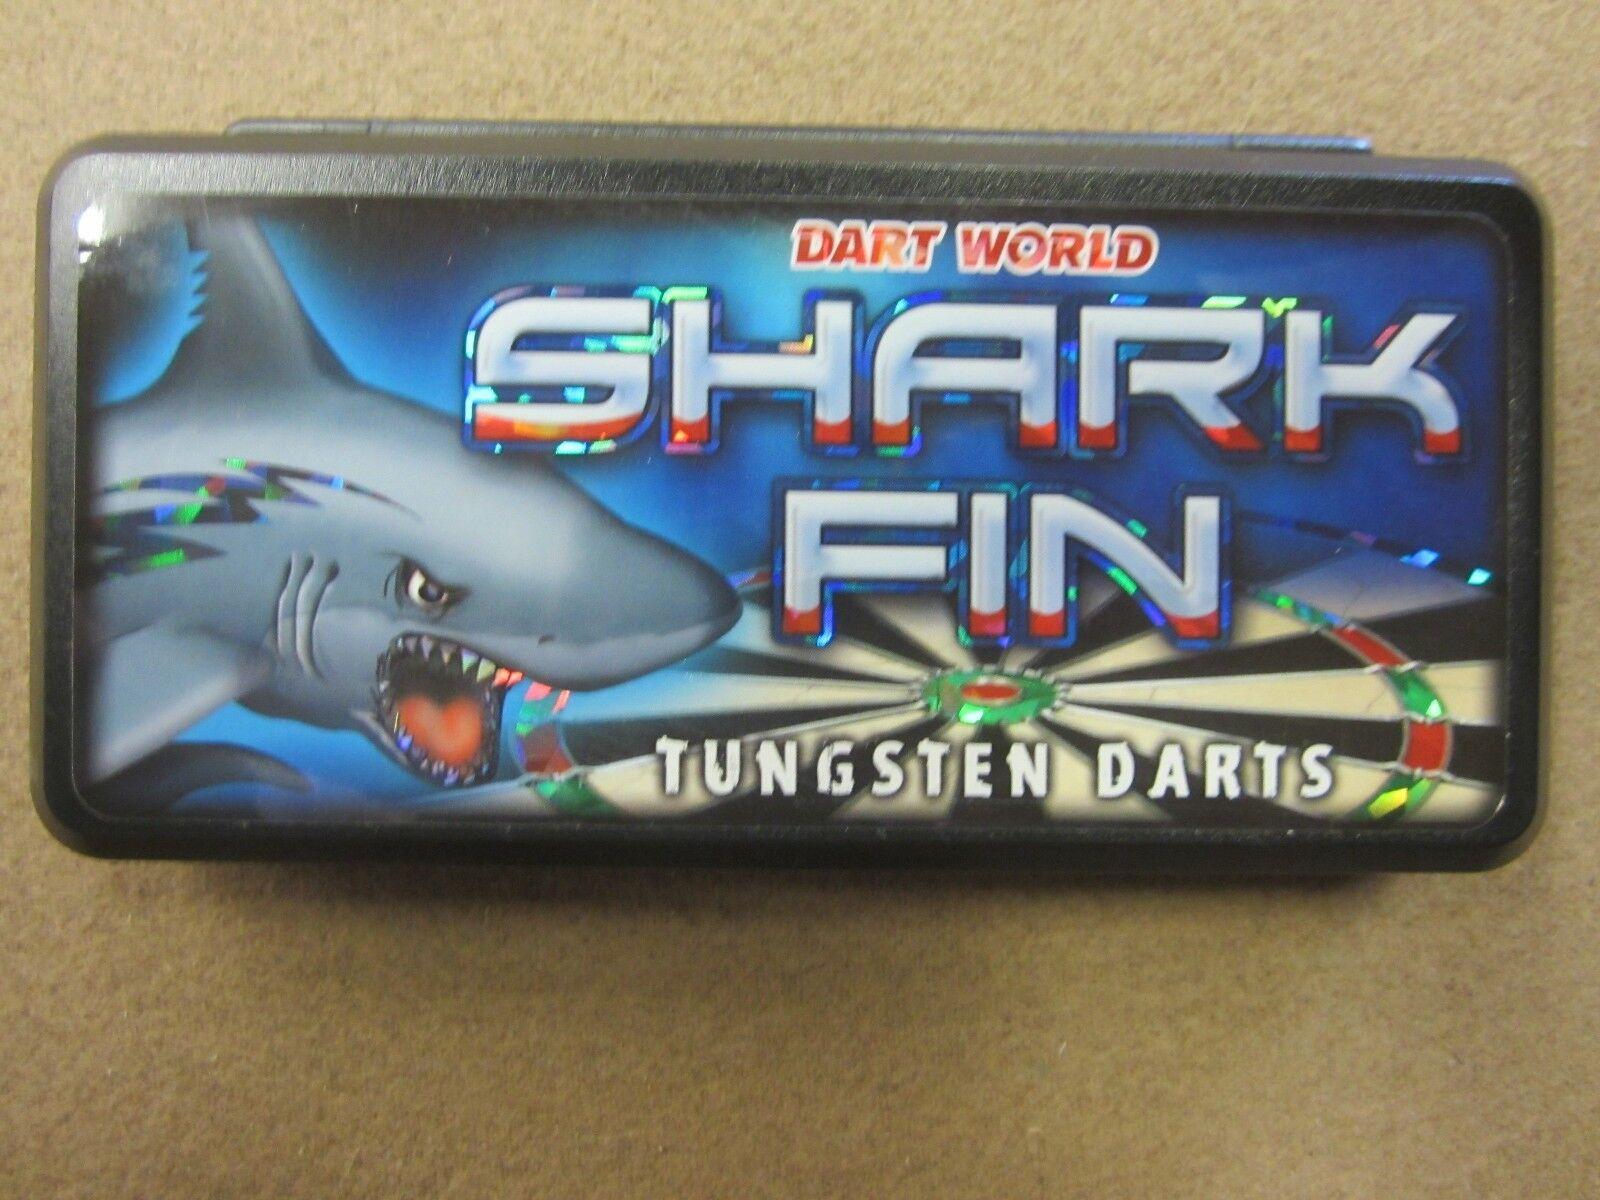 Shark Fin 28g Steel Tip Darts 80% 17206 Tungsten 17206 80% w/ FREE Shipping & Case ec4fa6